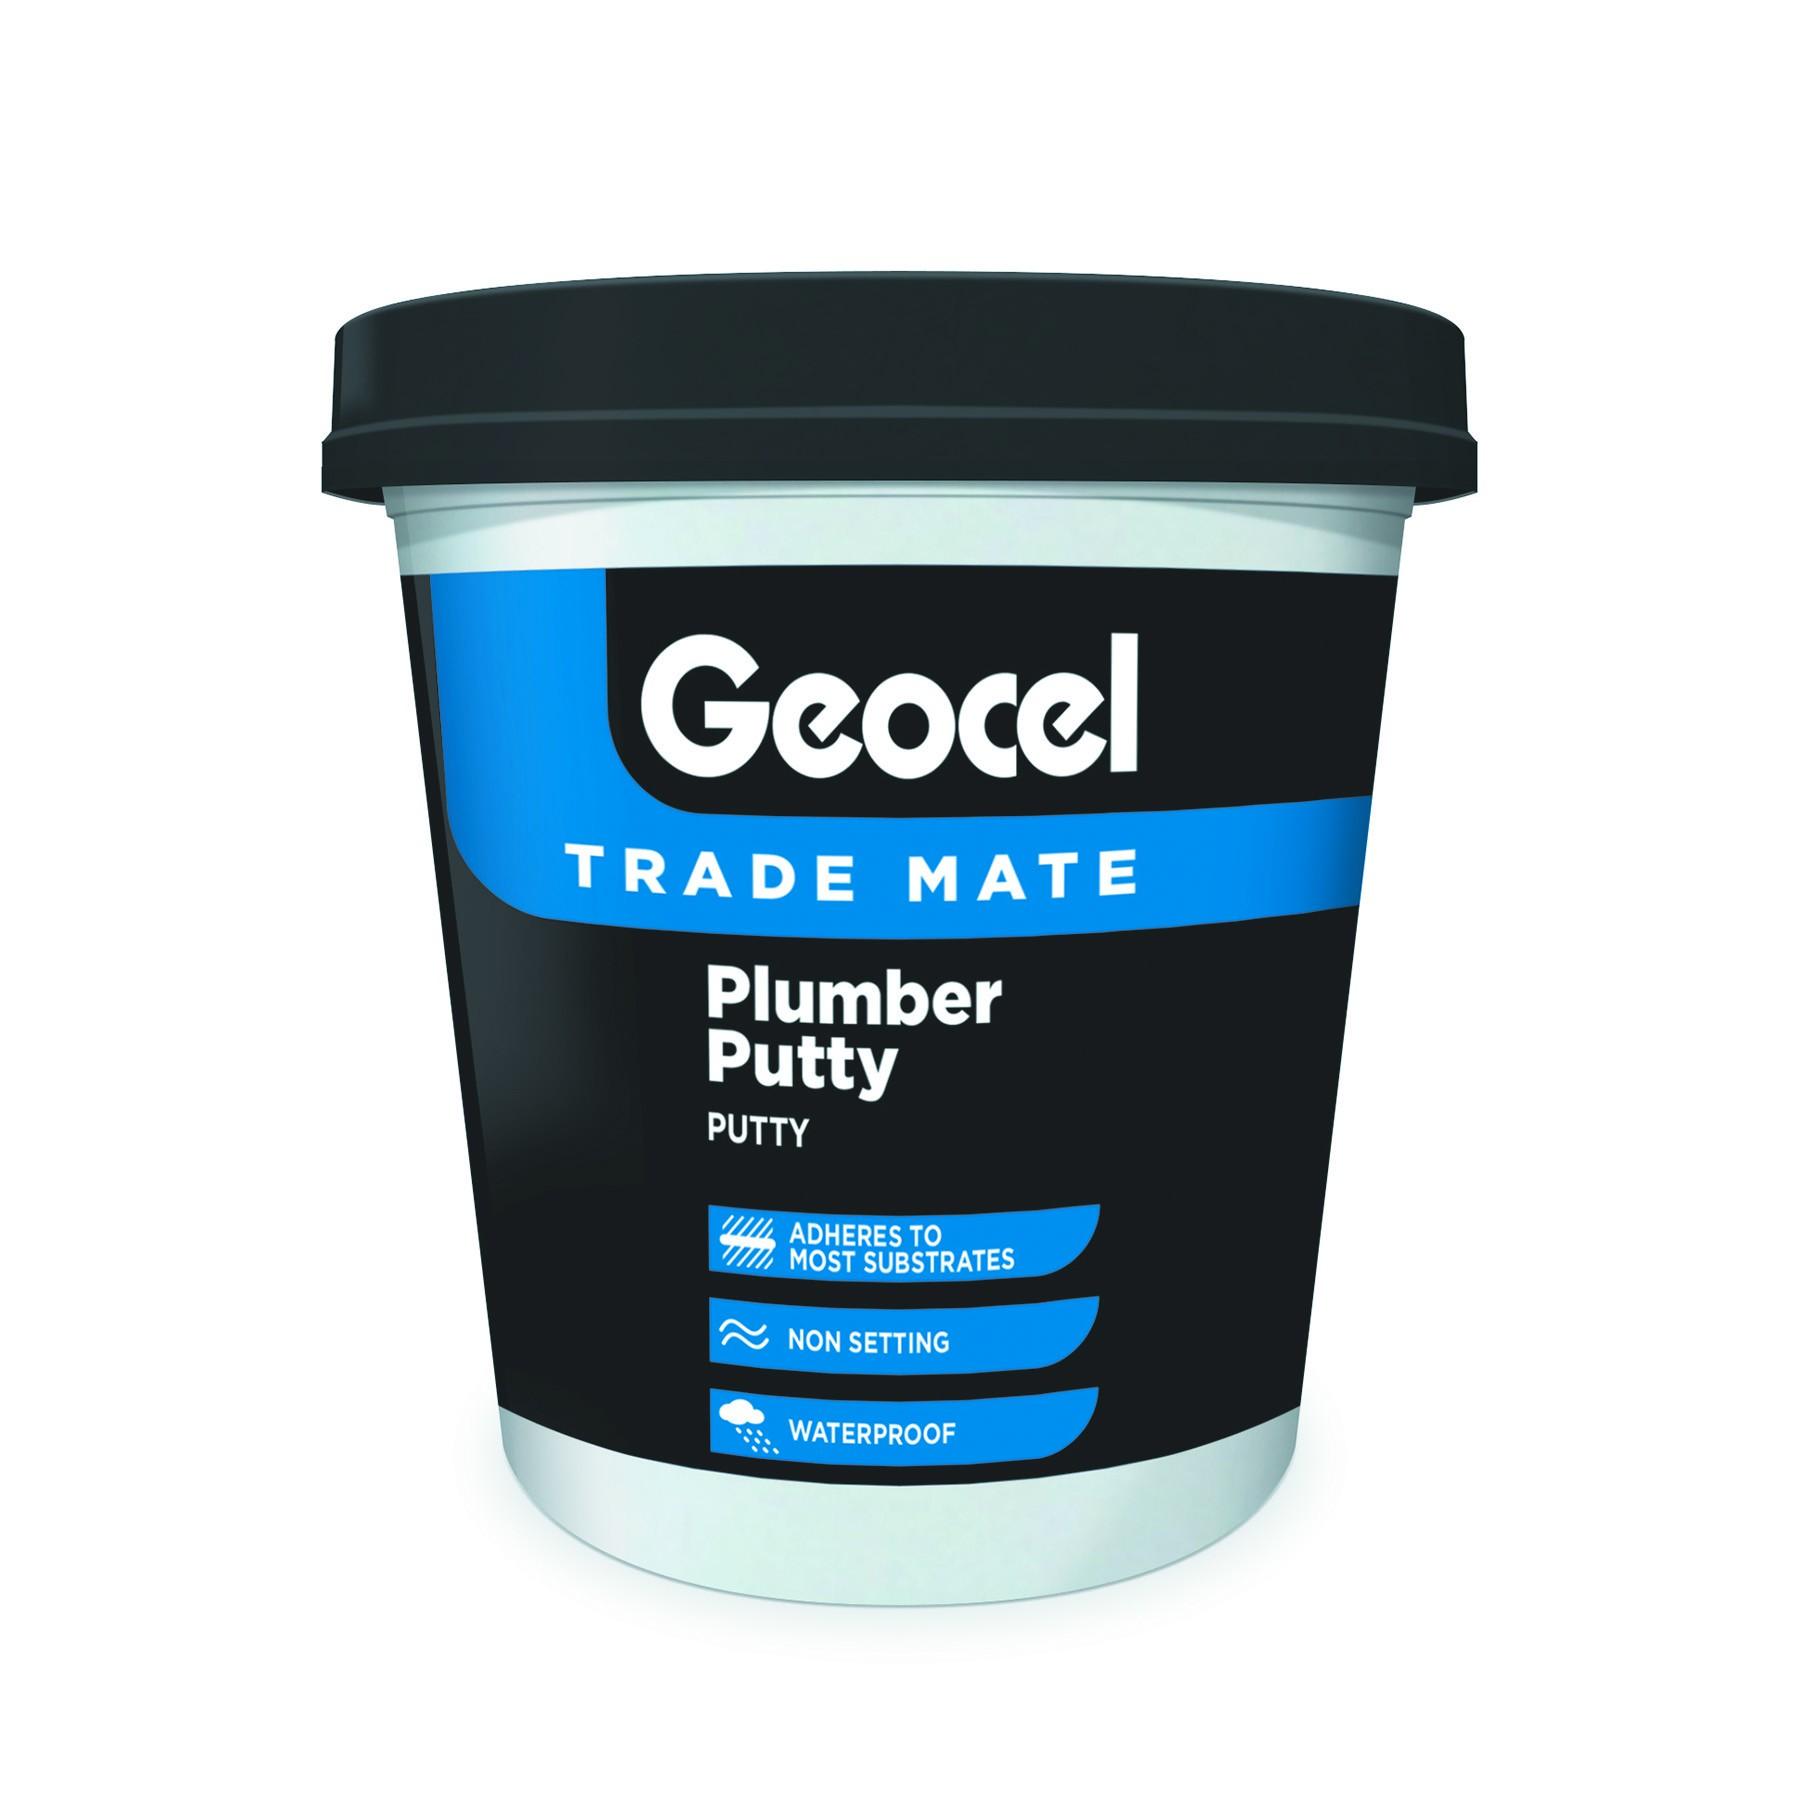 Geocel Trade Mate Plumber Putty 750g Grey [GEOTMPUTTY]